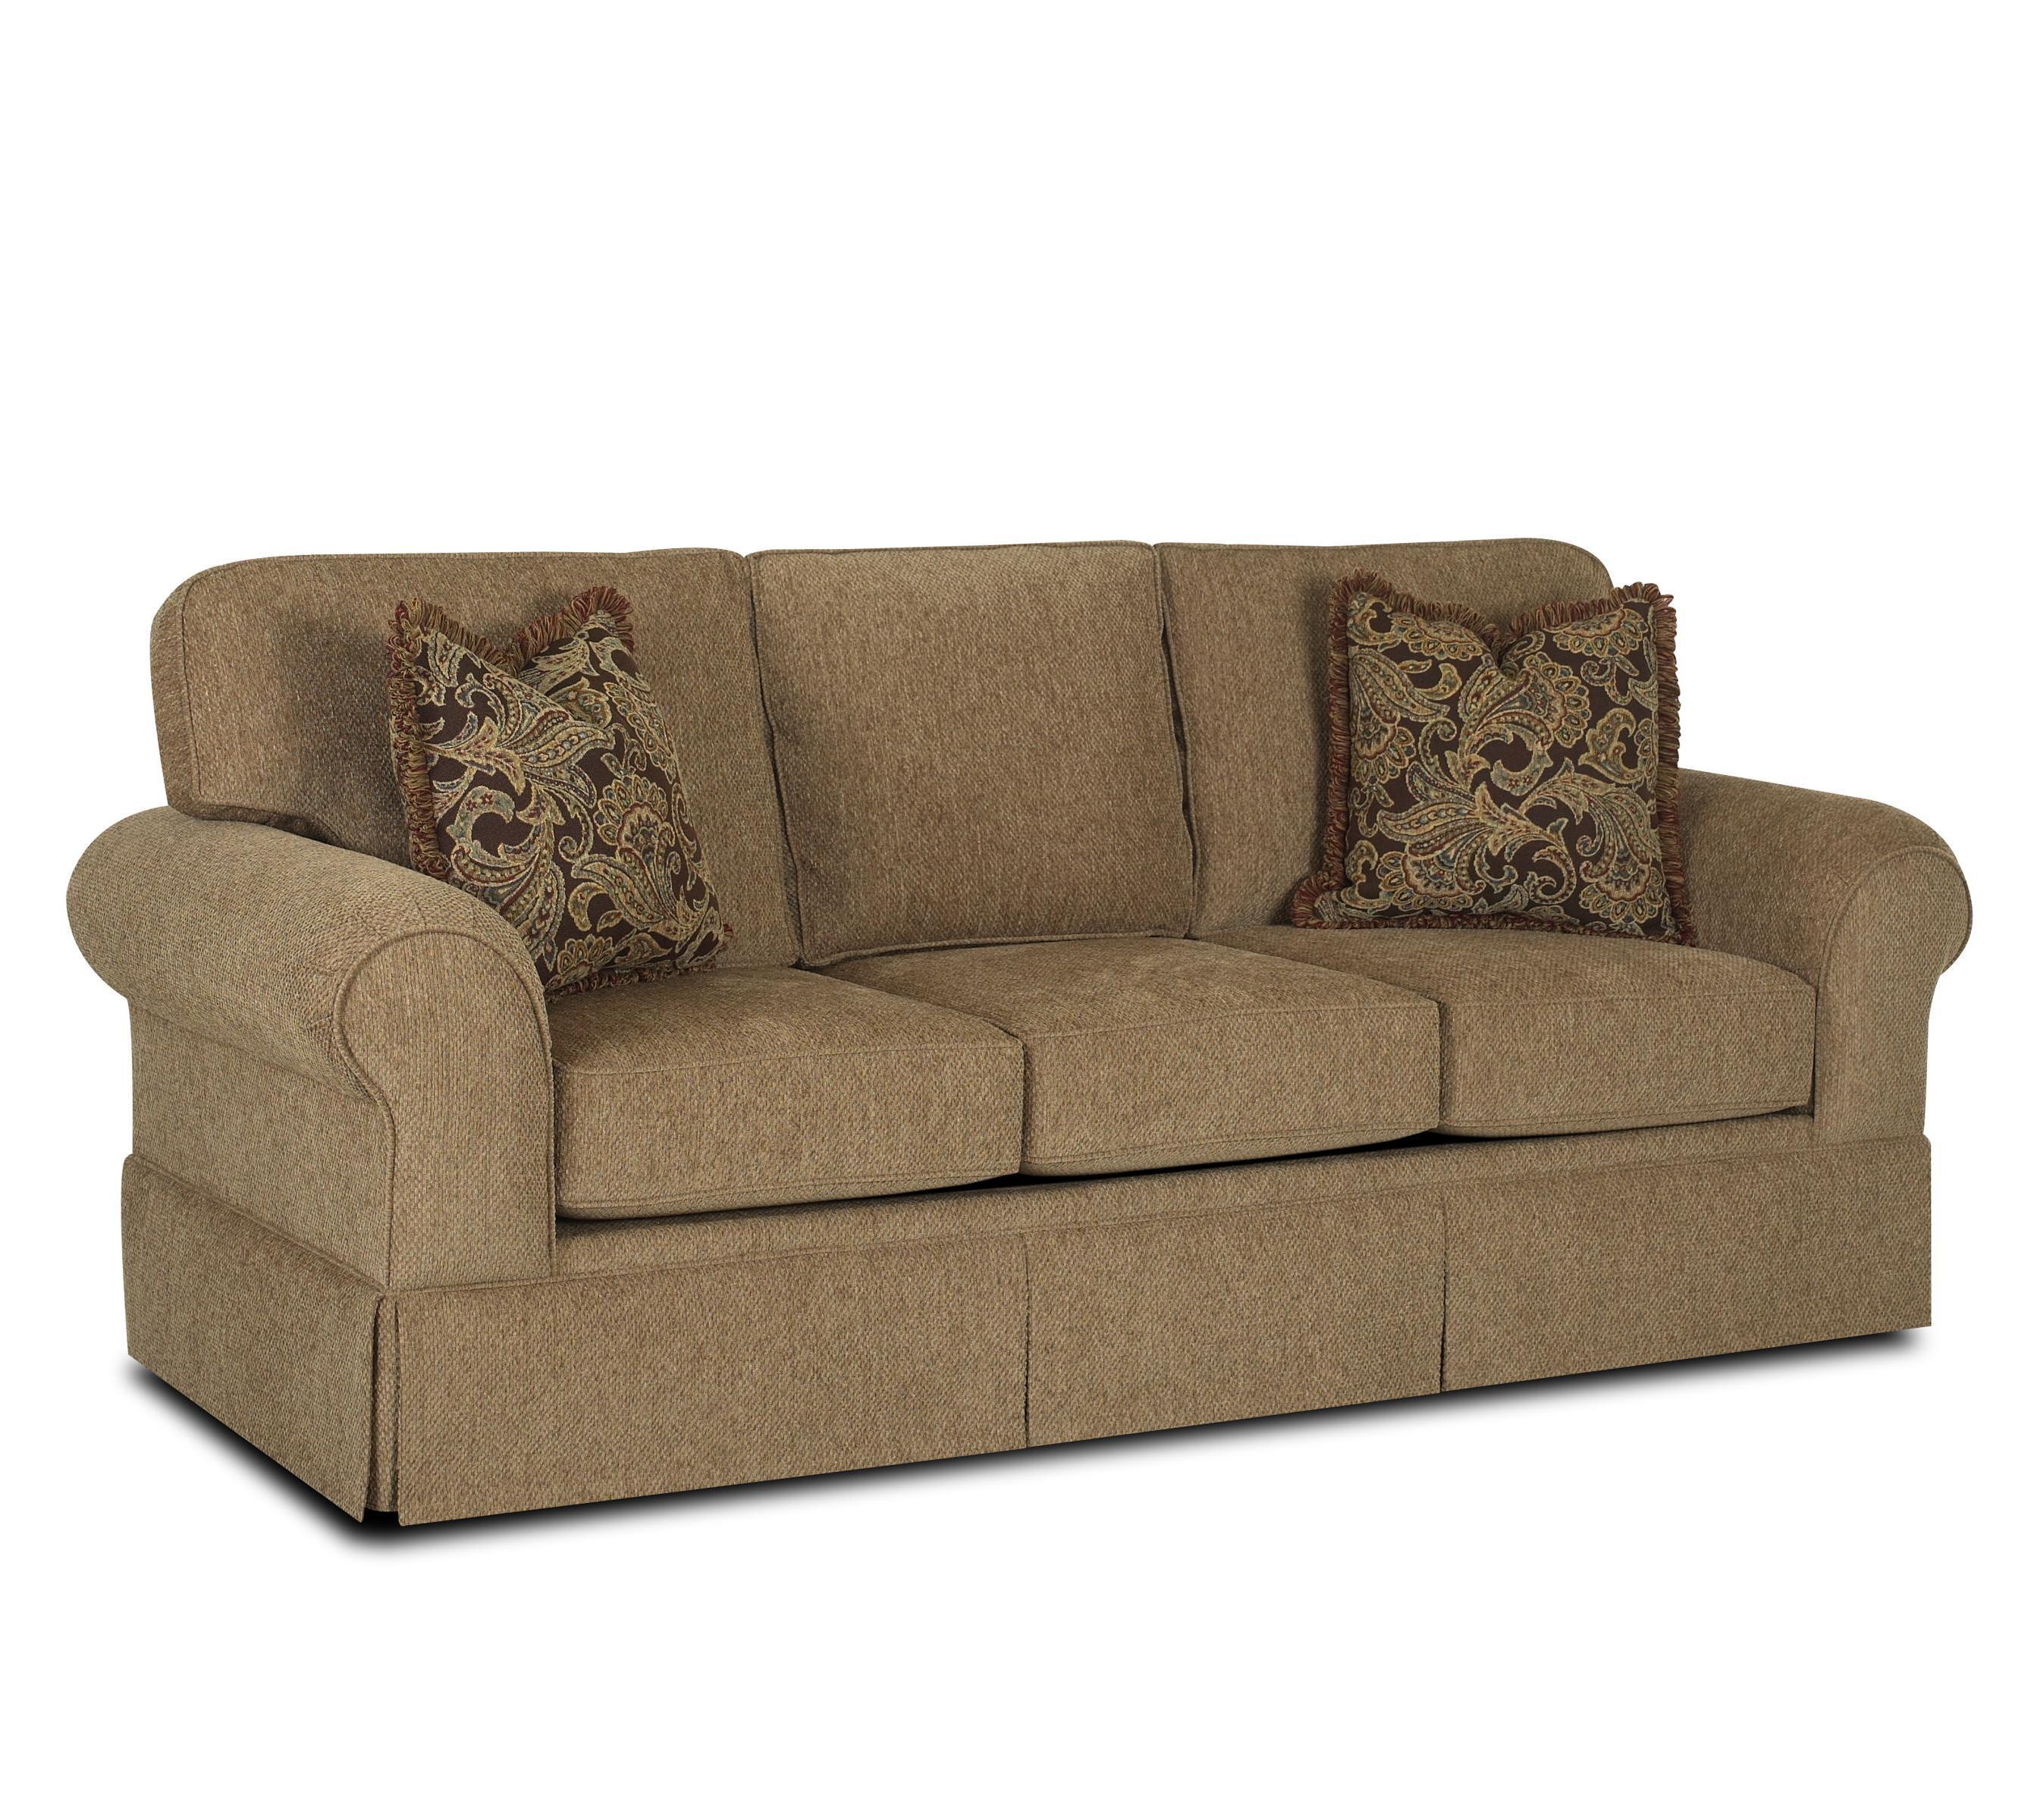 Klaussner Woodwin Sofa - Item Number: B48930S